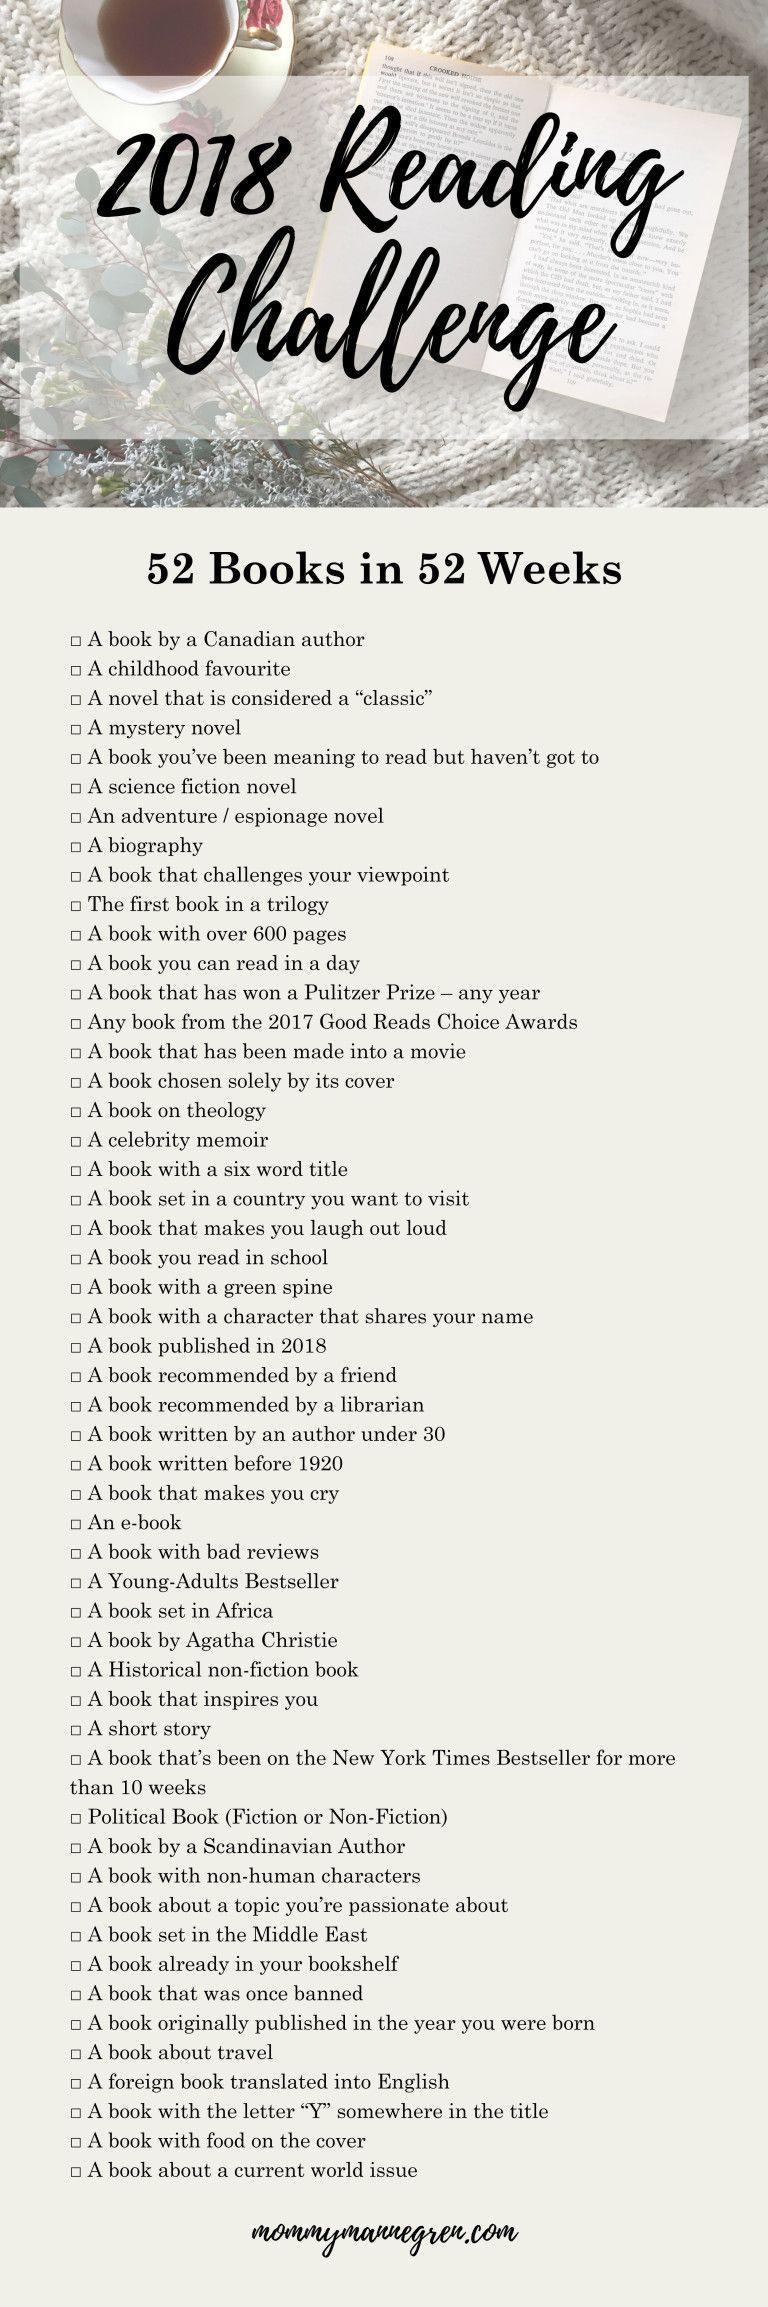 2018 Reading List